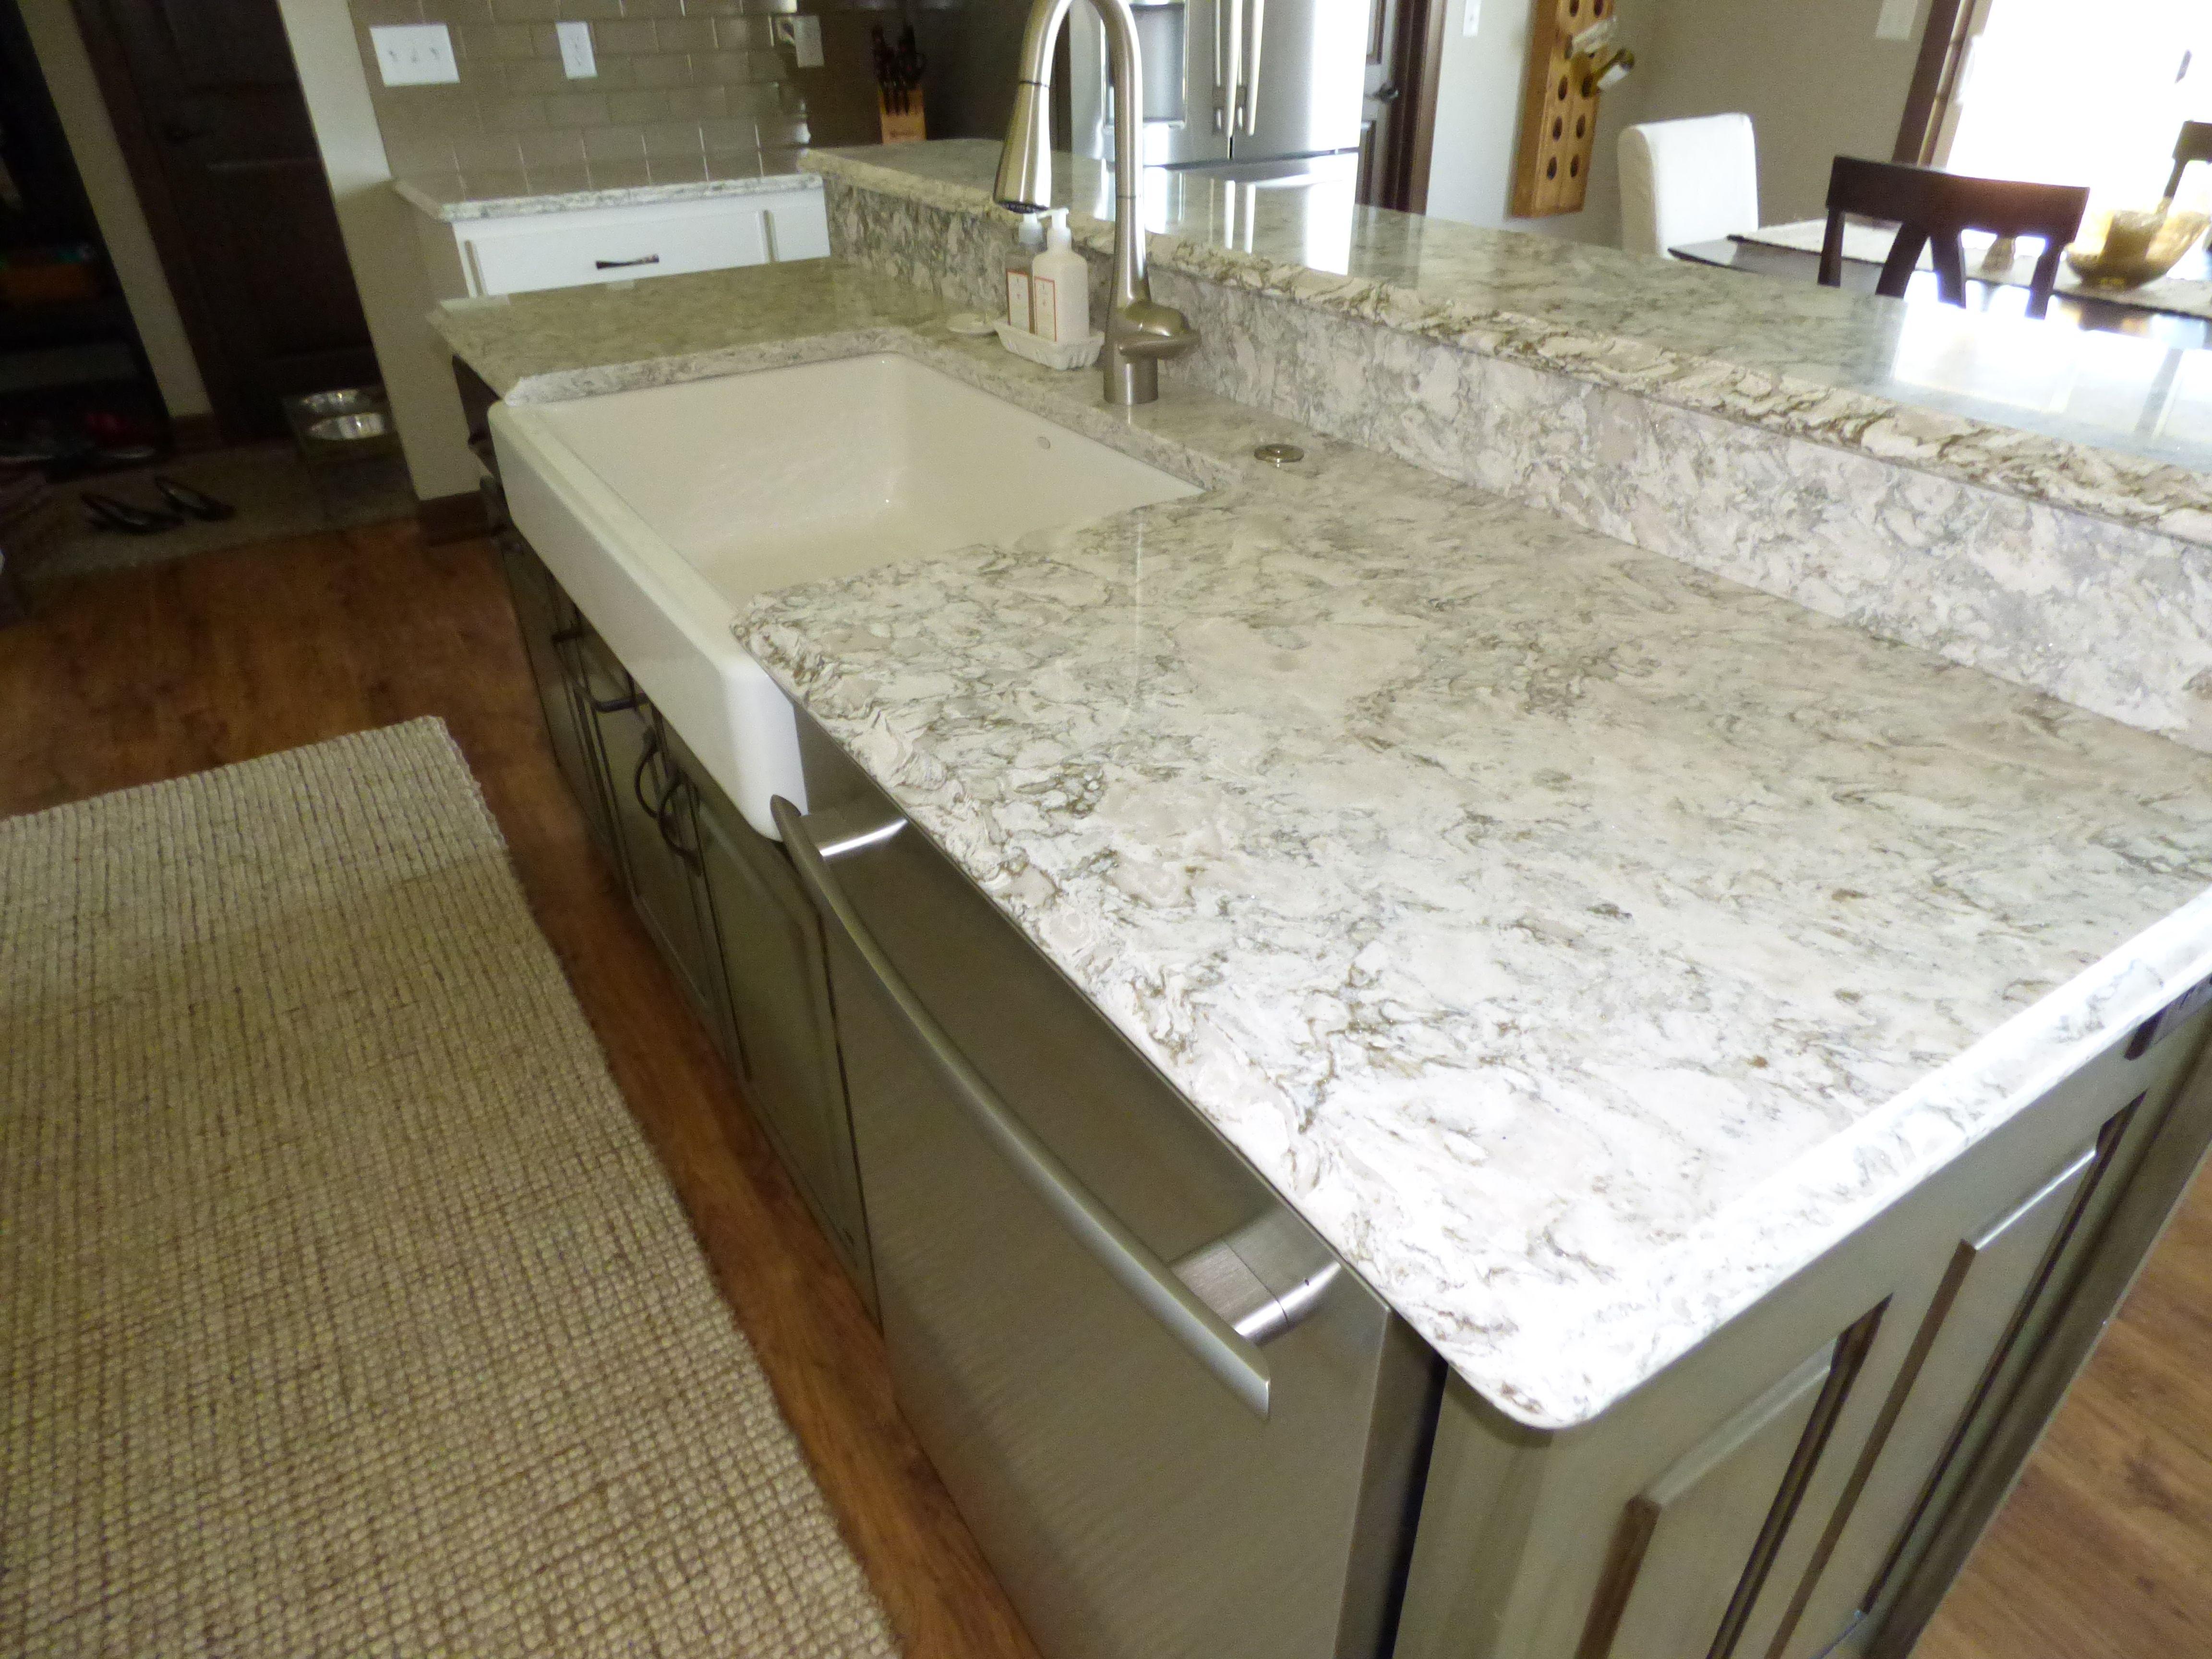 blog and perimeter surfaces justin berwyn creative quartz countertop kitchen cambria countertops pins island